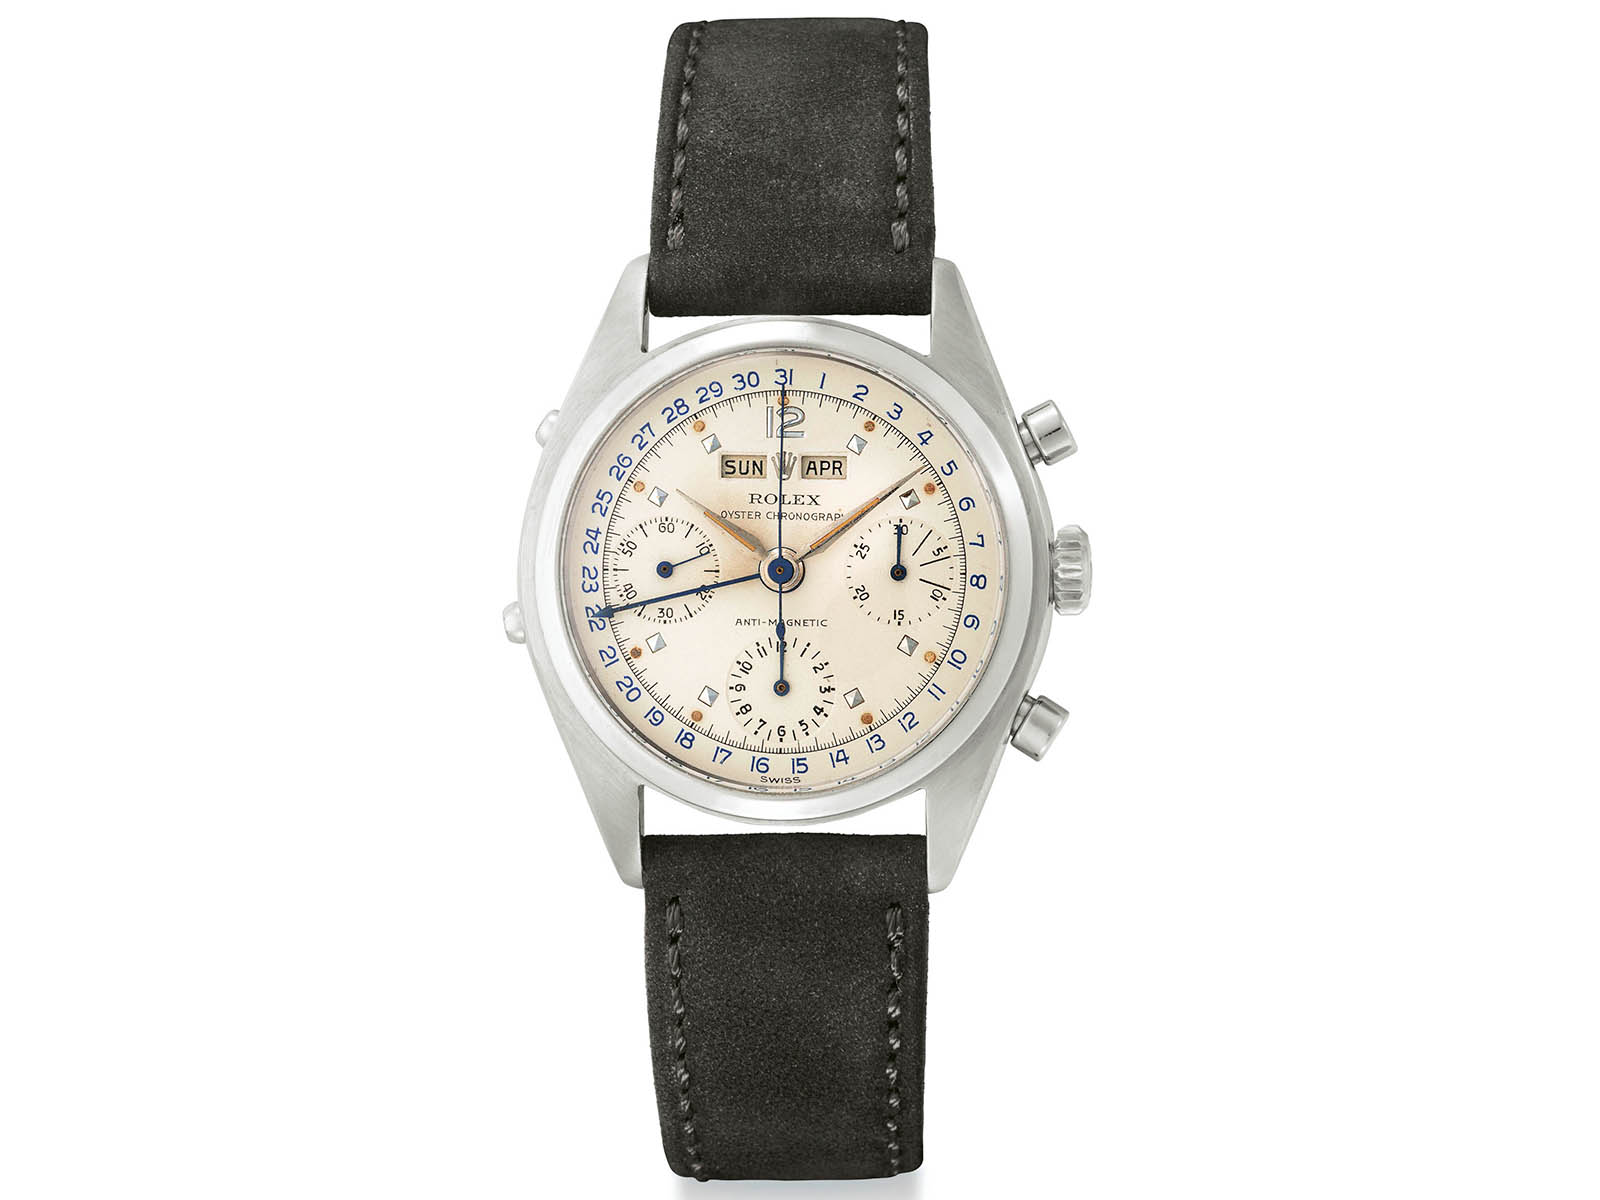 6036-rolex-triple-calendar-chronograph.jpg